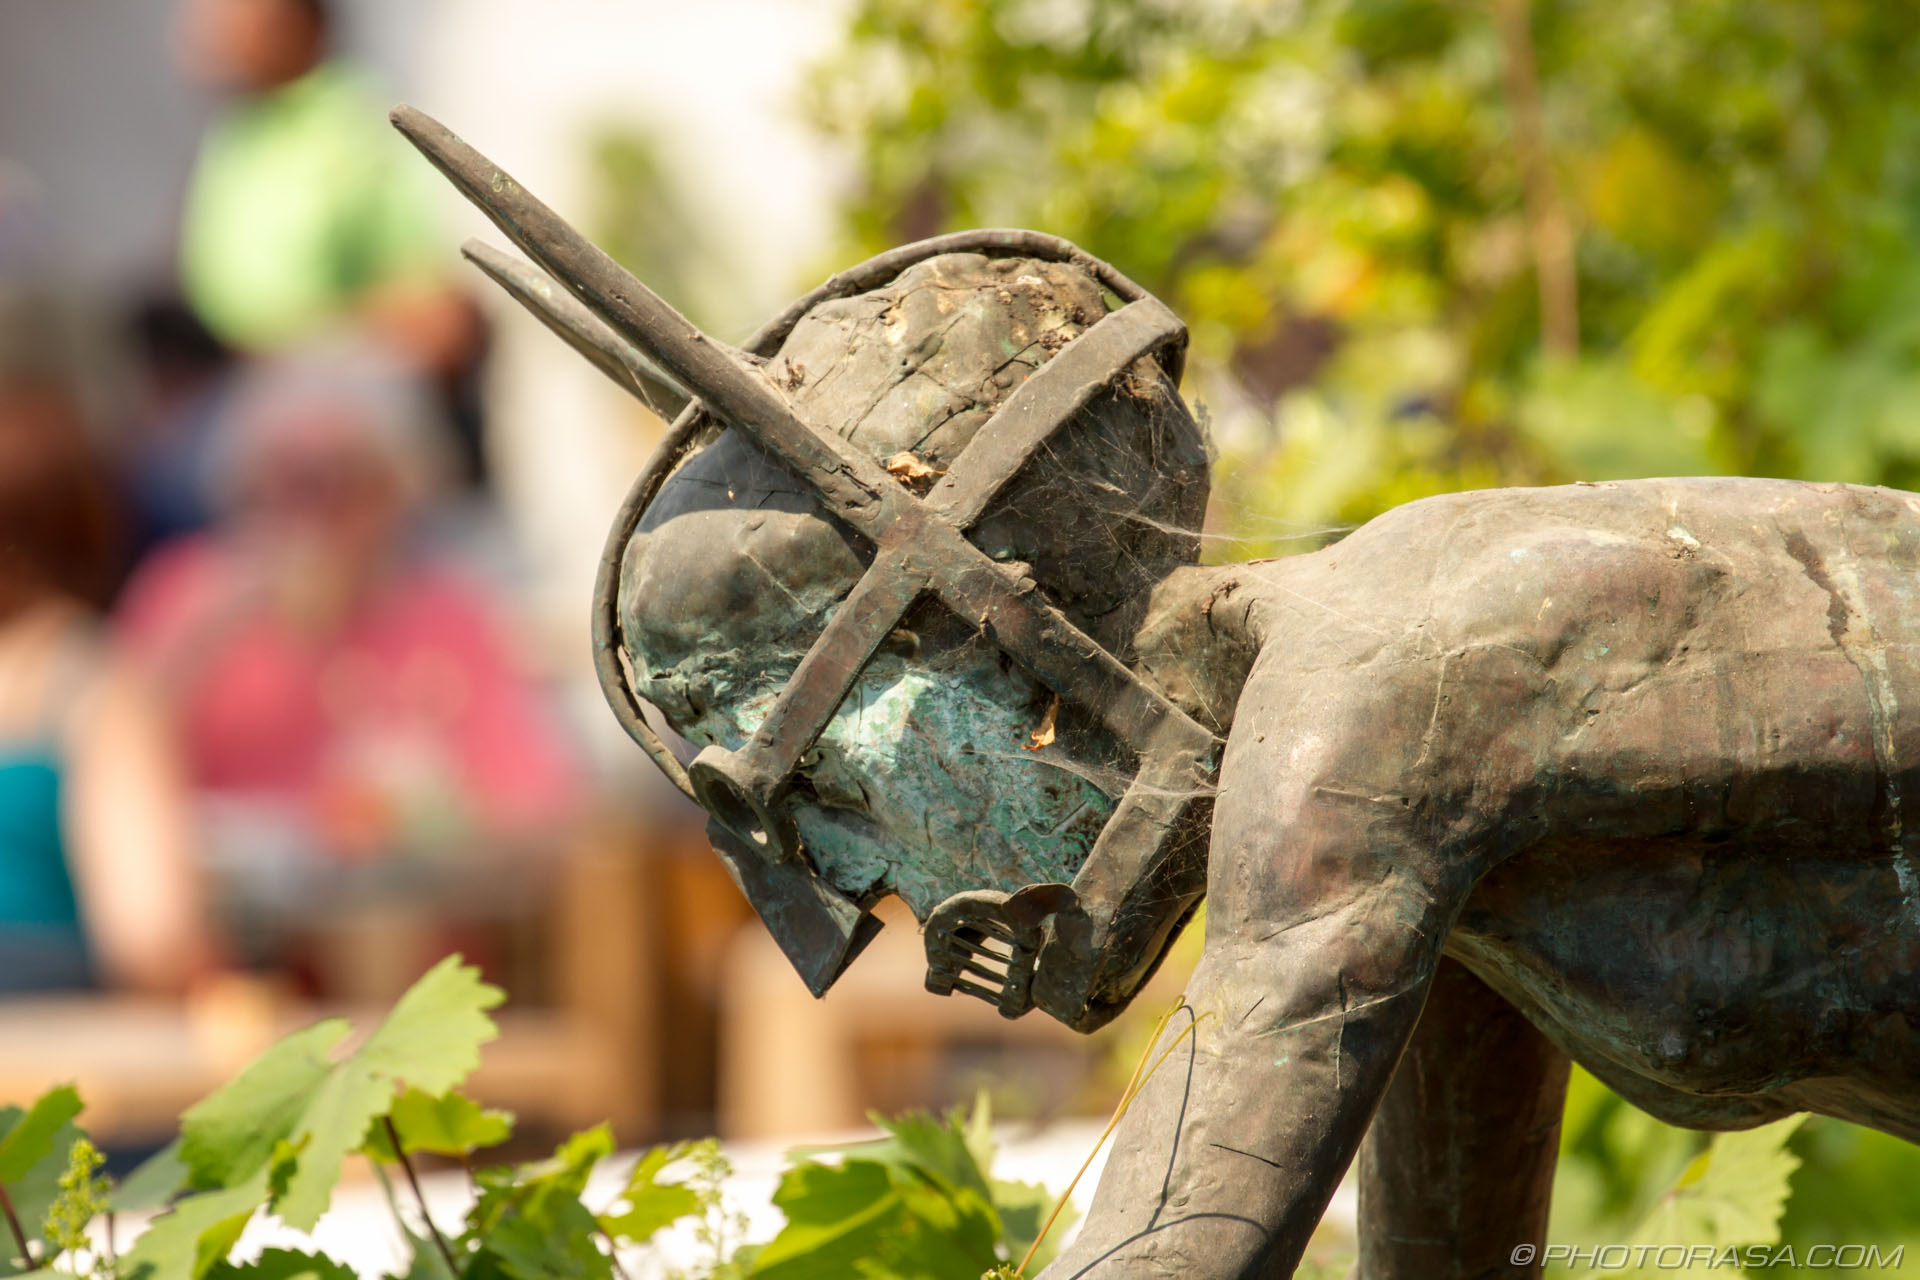 http://photorasa.com/garden-sculptures/head-of-pagan-reveller/